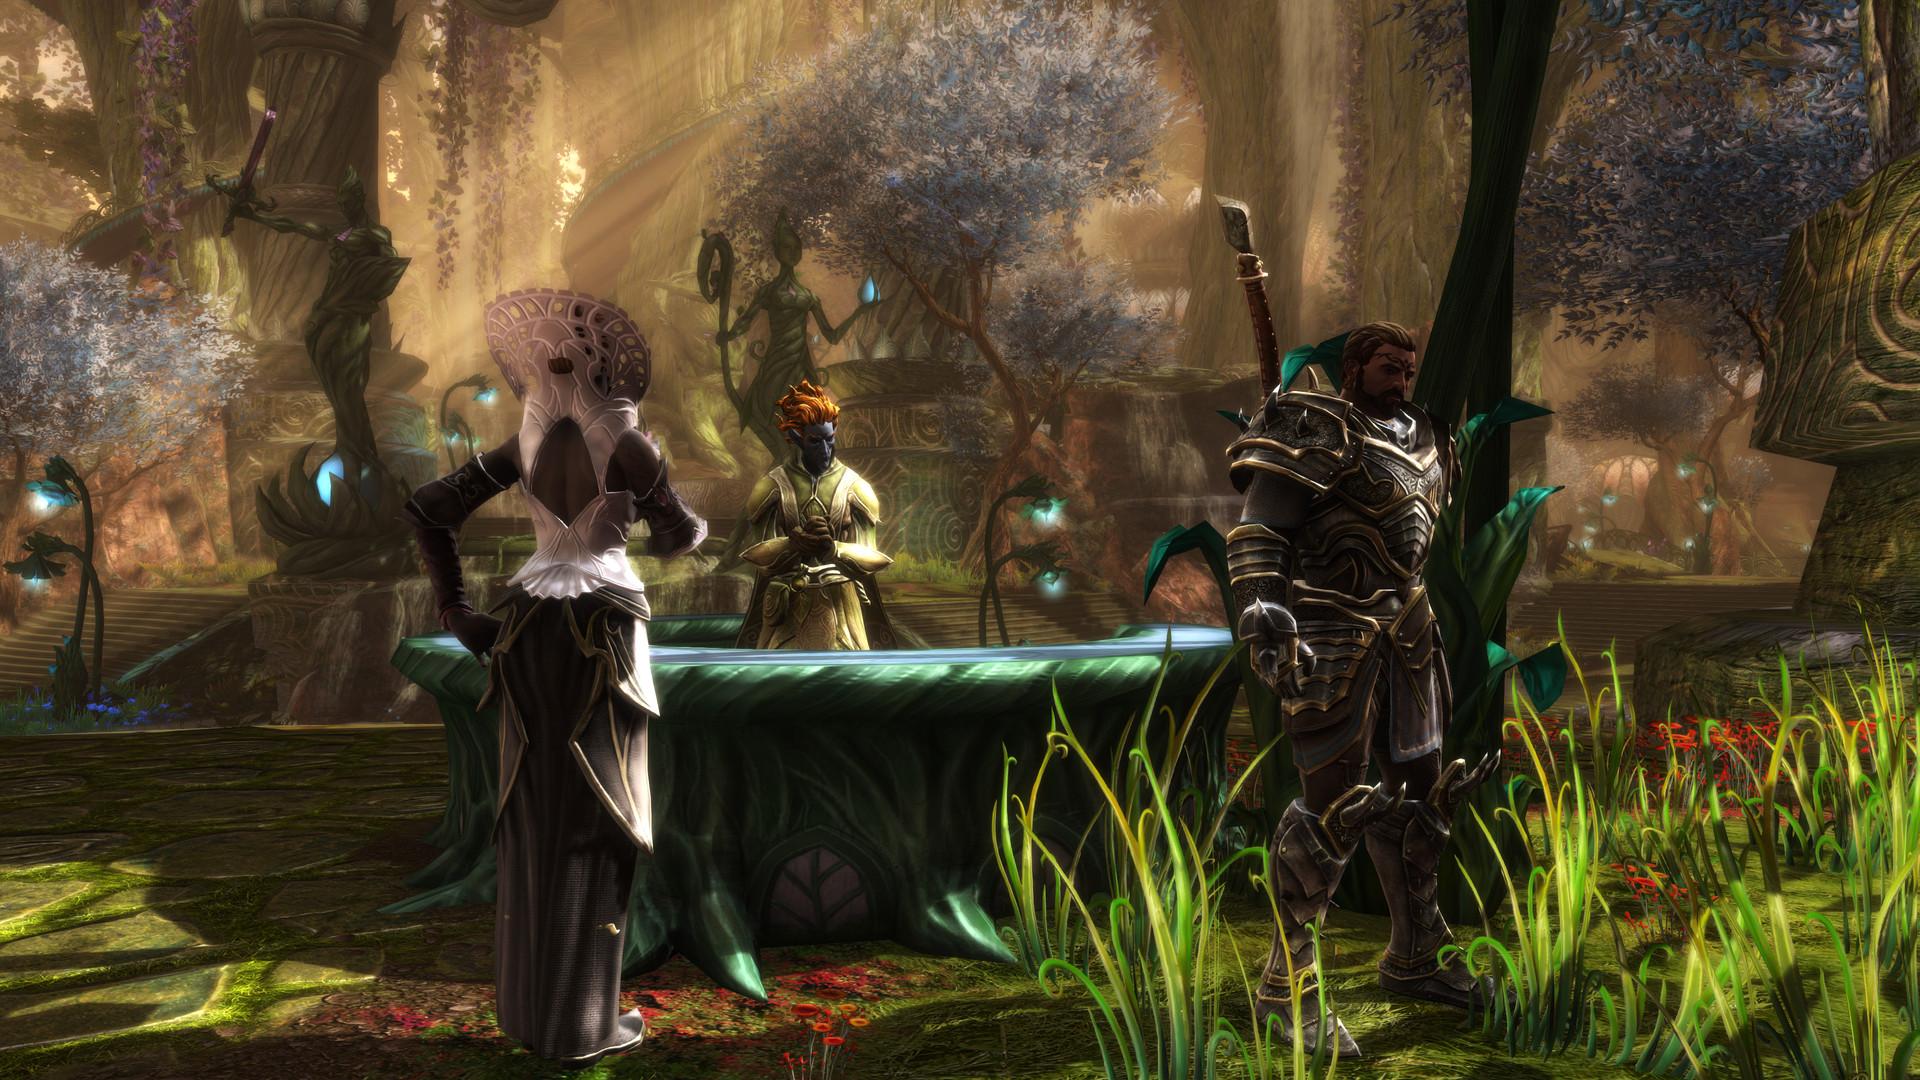 Kingdoms of Amalur: Re-Reckoning on Steam